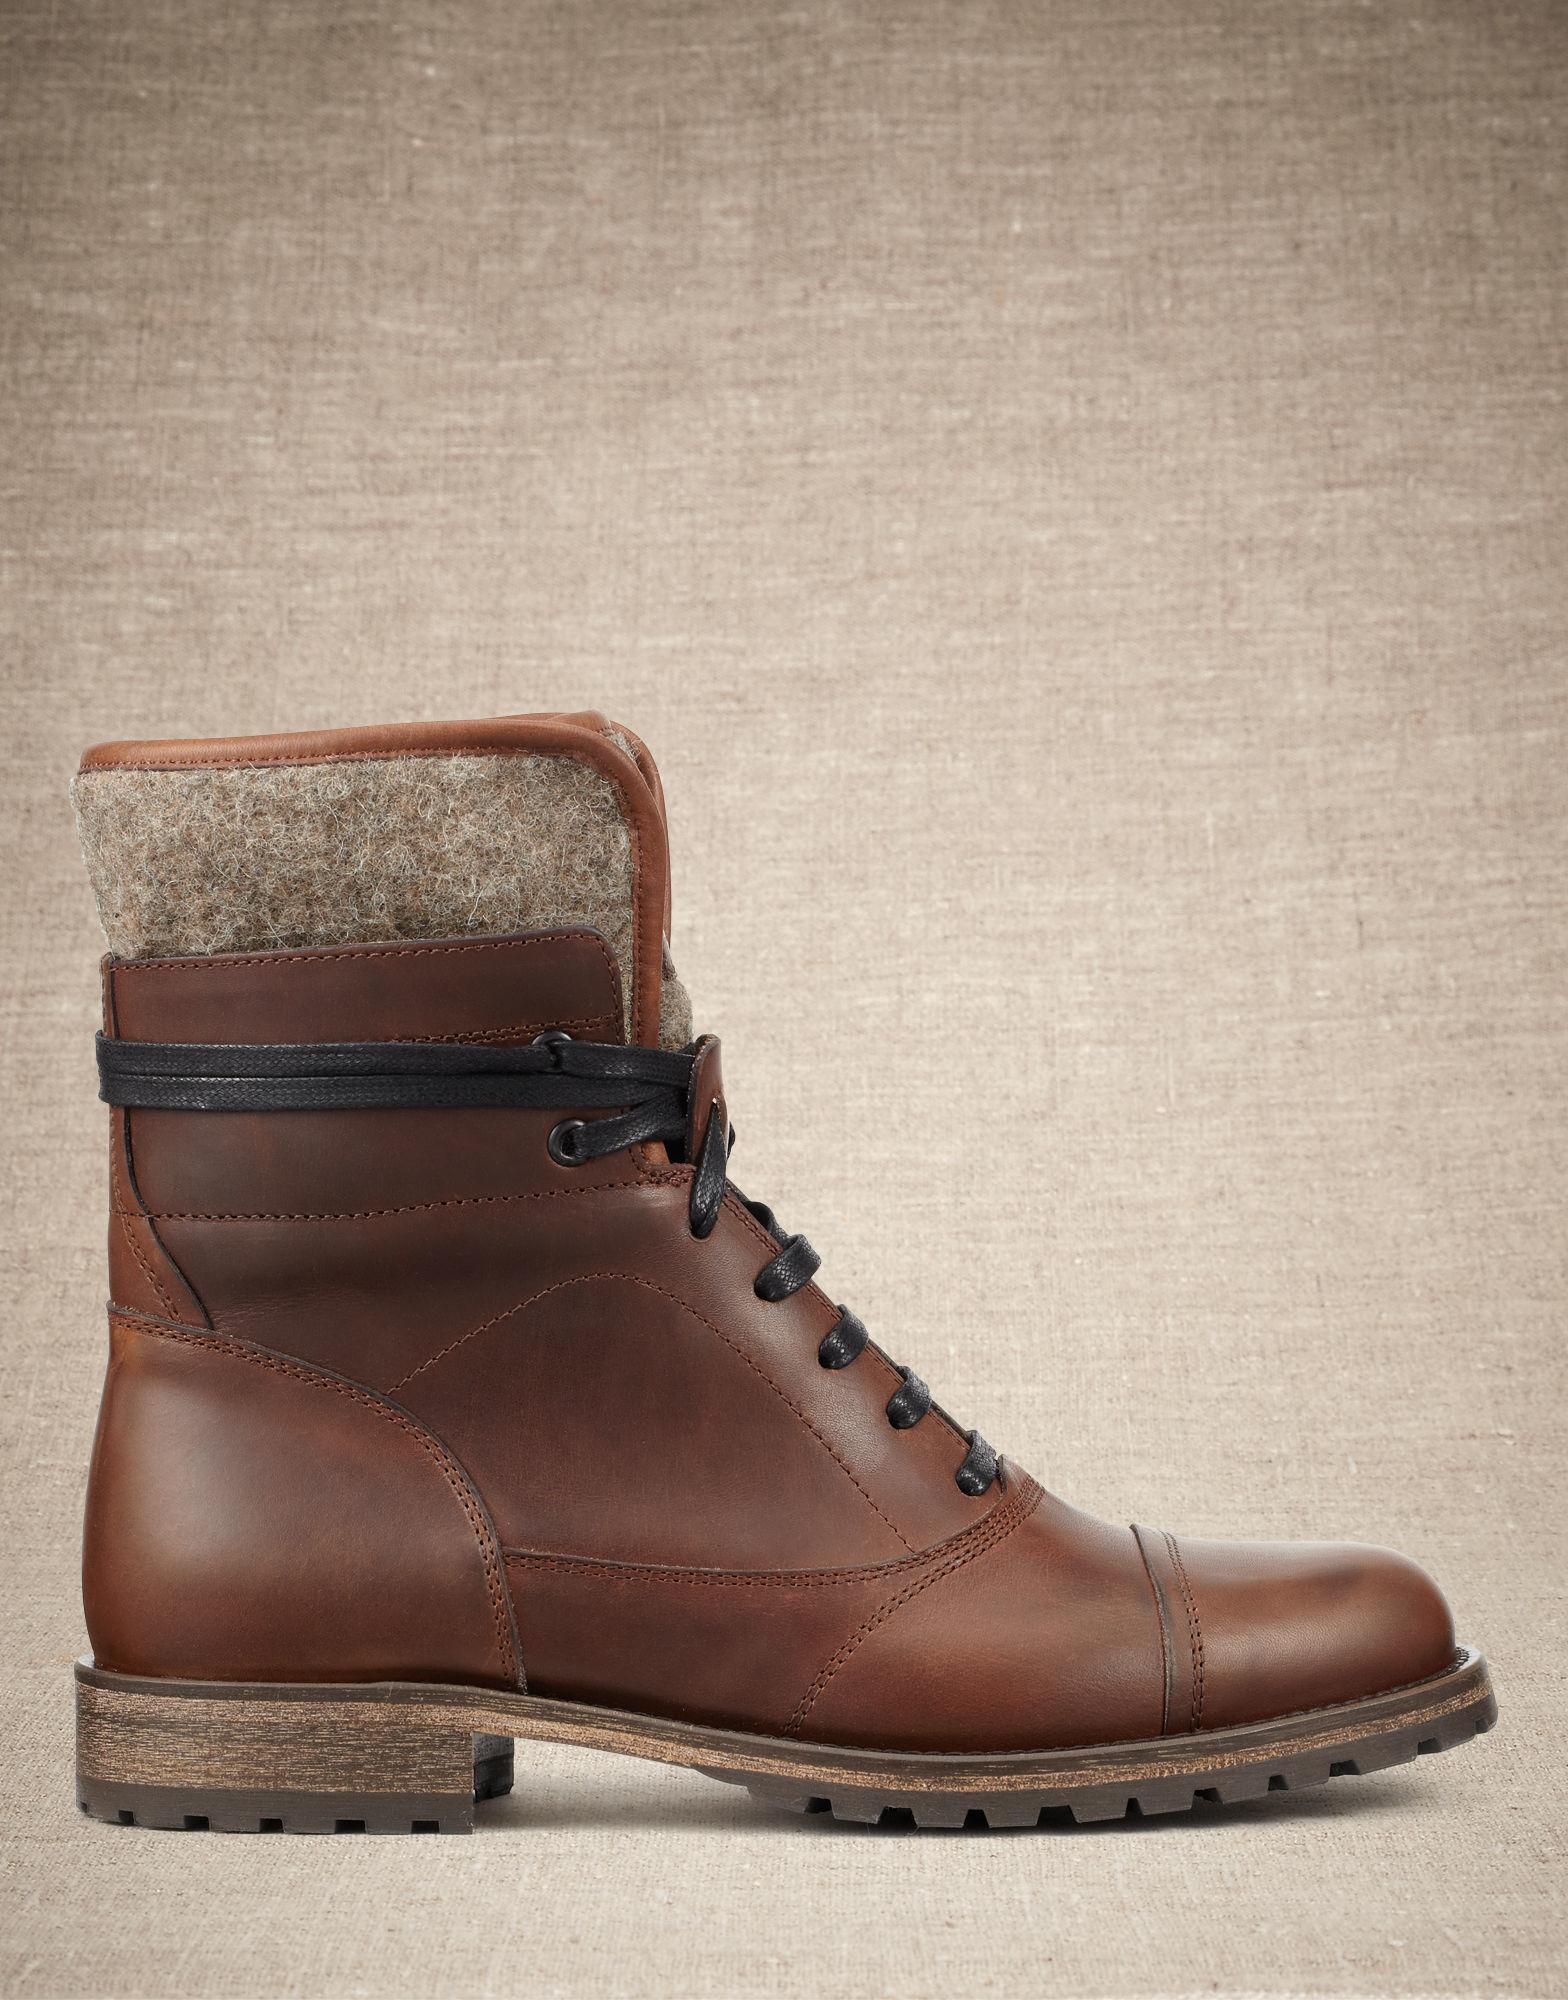 80fee435315 Belstaff Faystar Boot in Brown for Men - Lyst